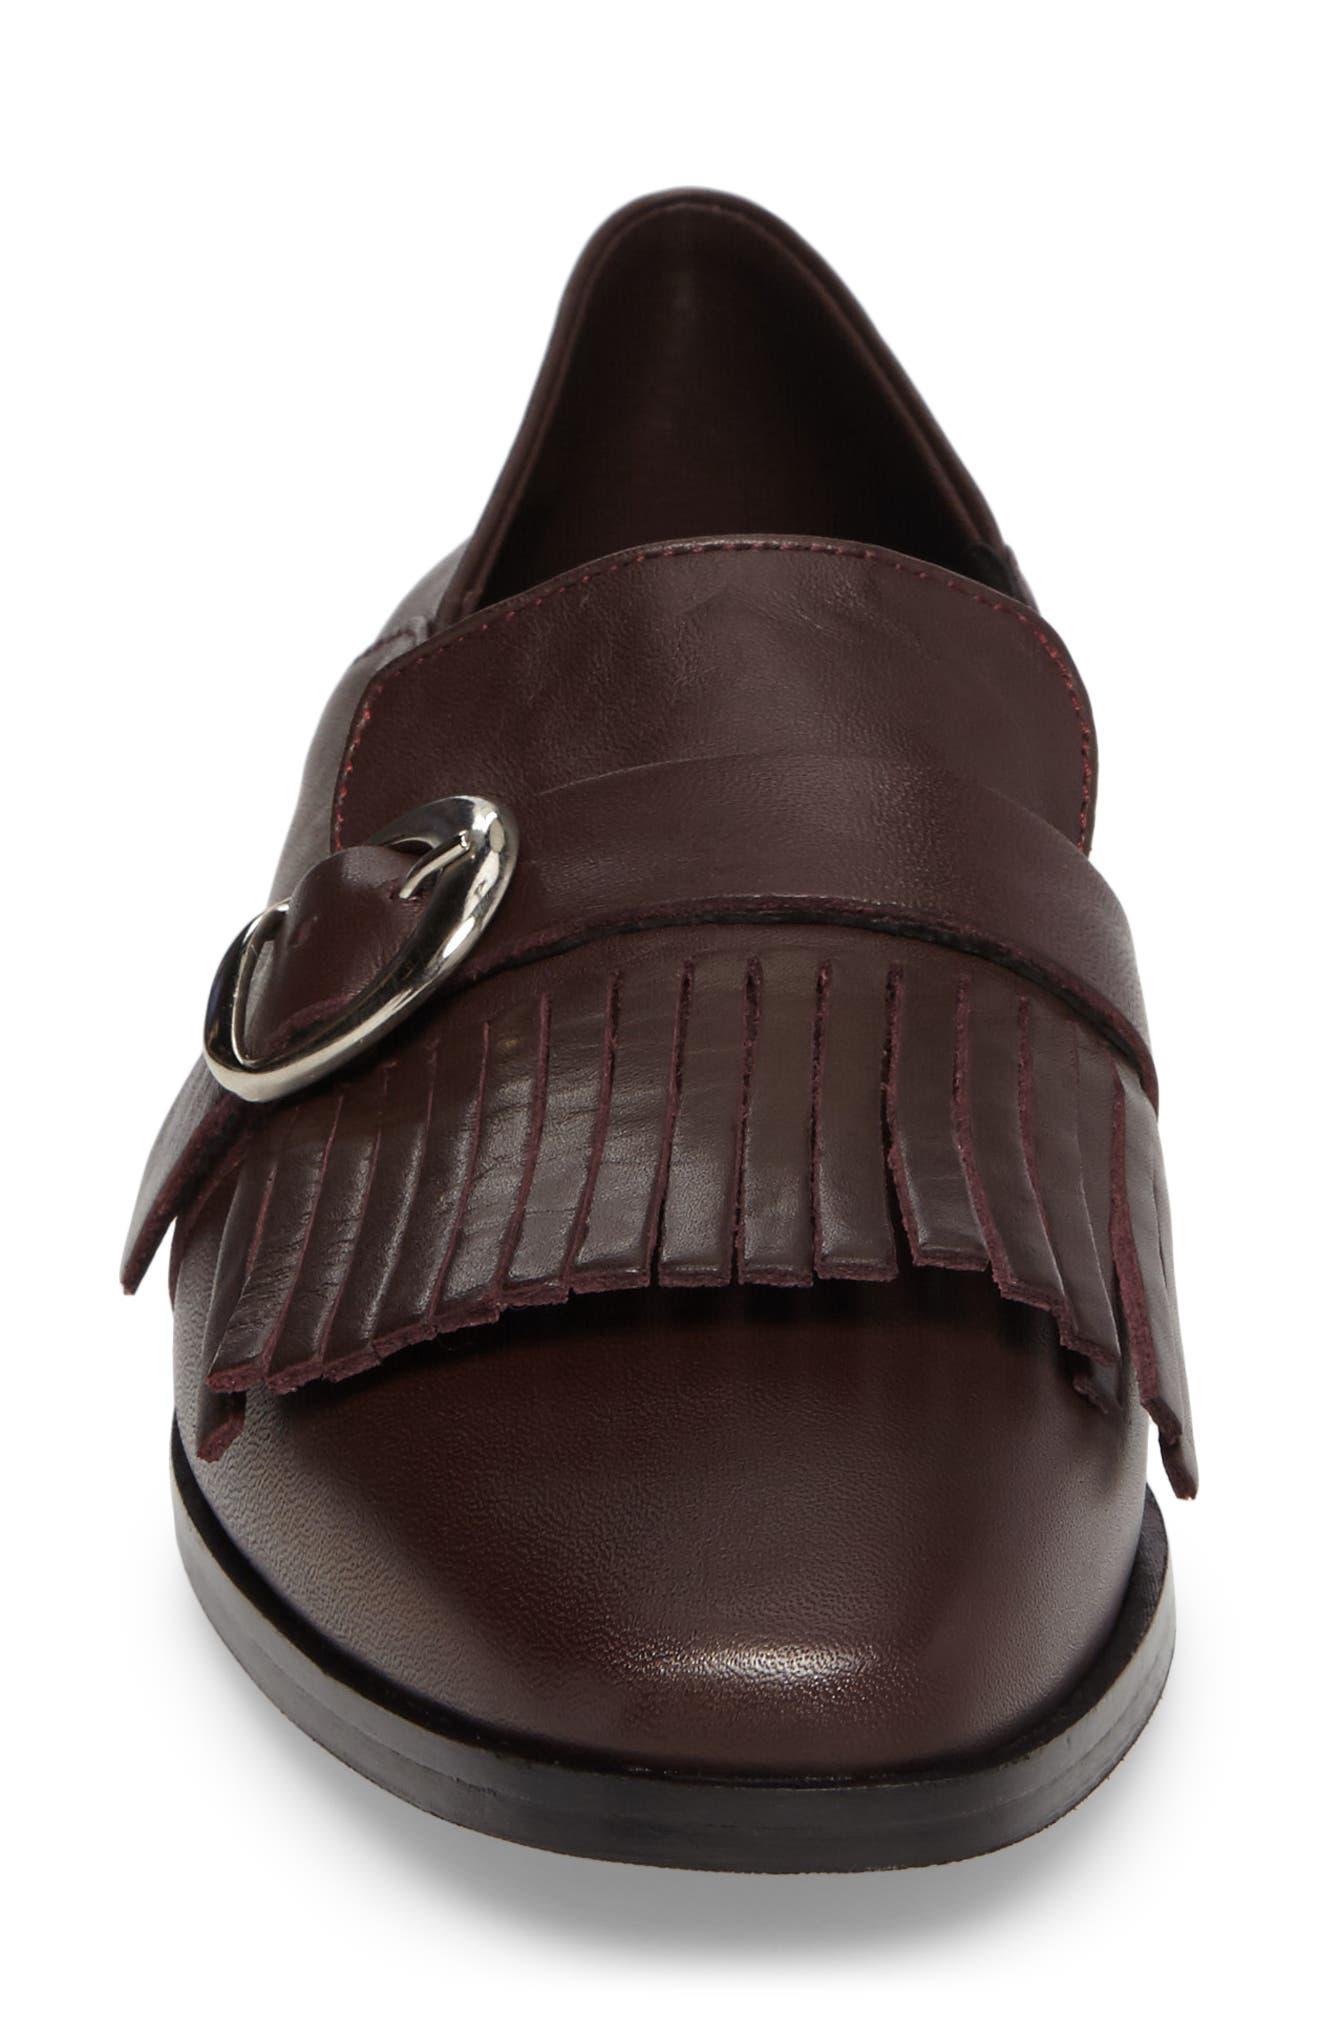 Dame Fringed Loafer Flat,                             Alternate thumbnail 4, color,                             Burgundy Leather